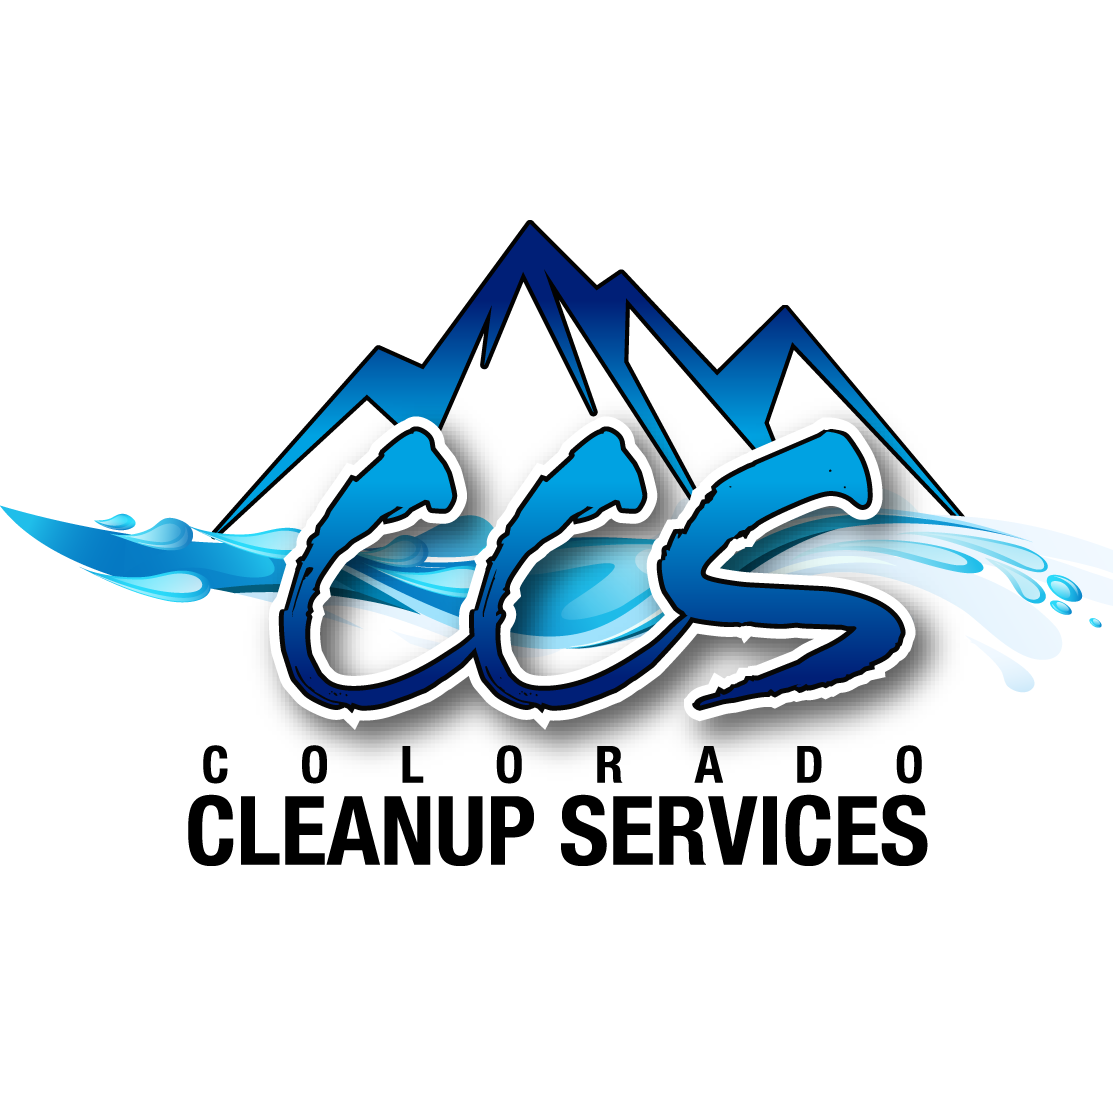 Colorado Cleanup Services, Inc. - Denver, CO - Water & Fire Damage Restoration